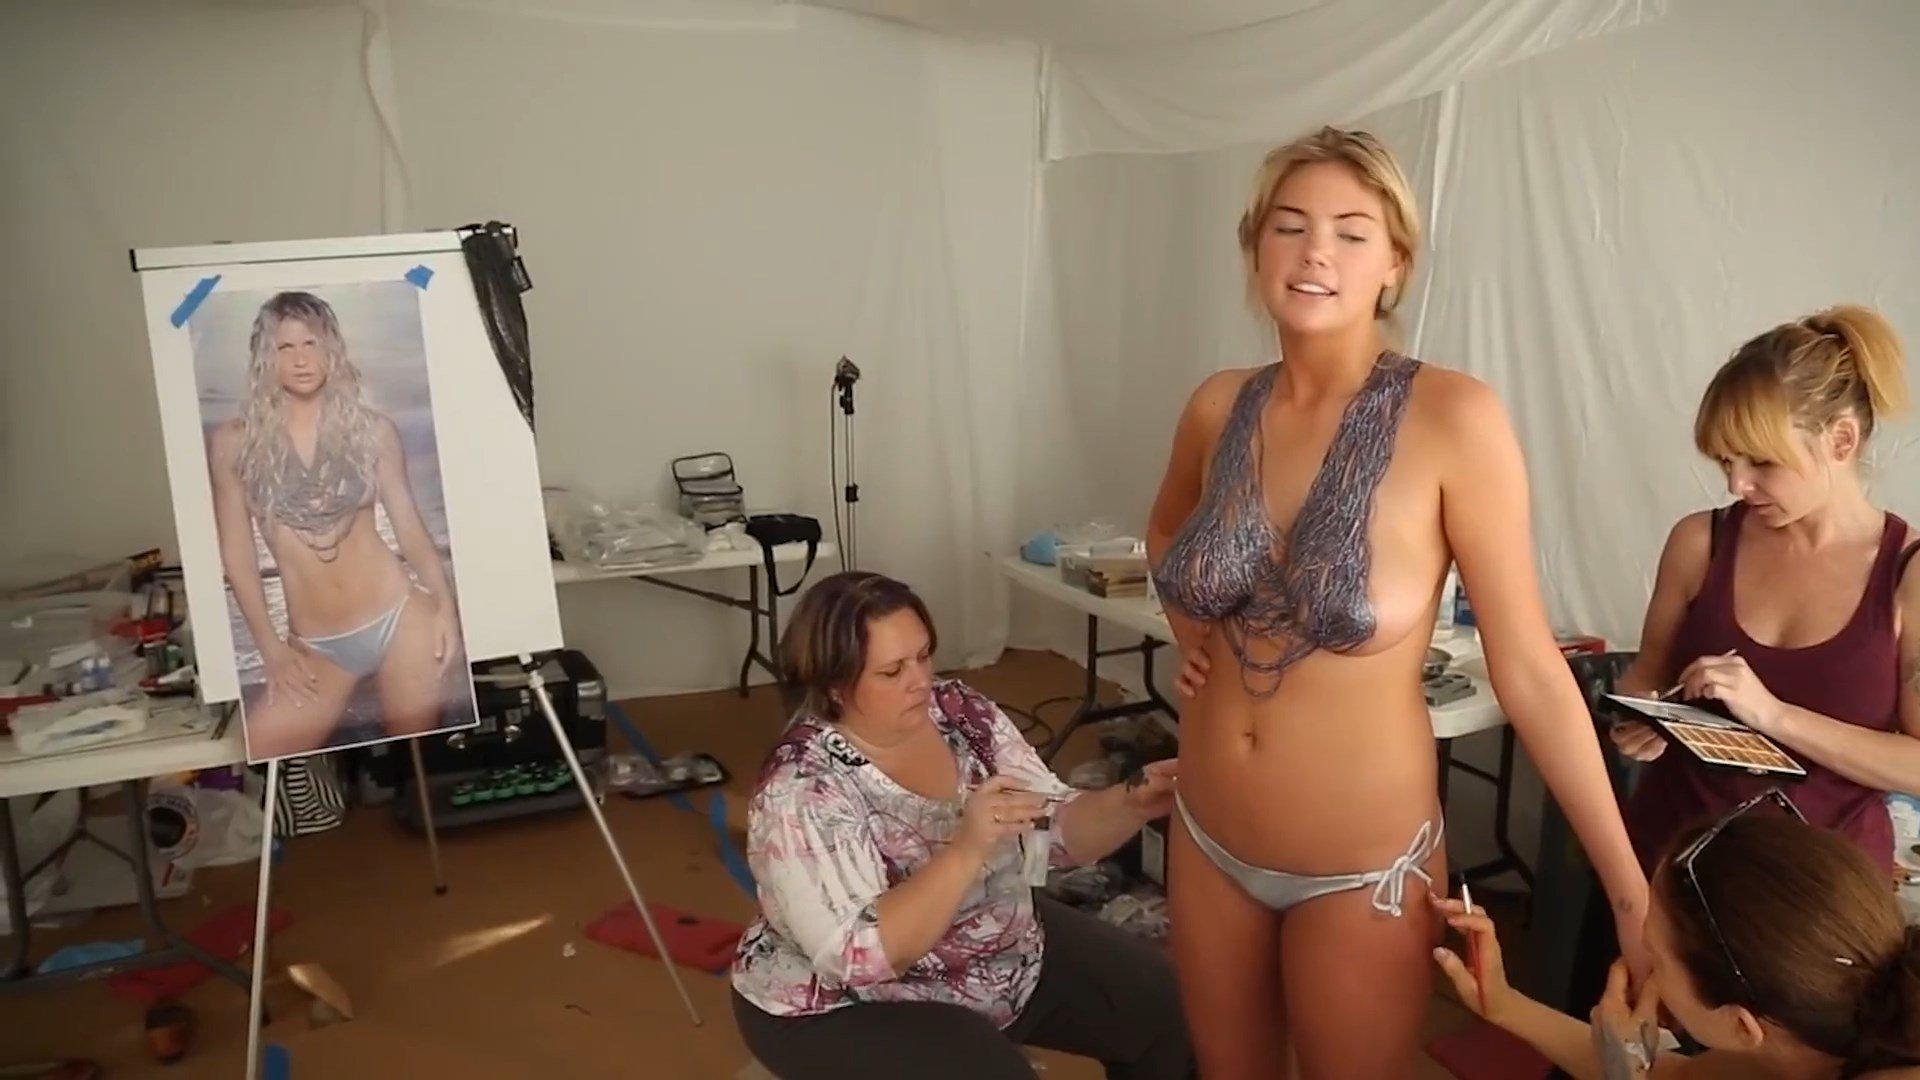 Kate Upton Nude Body Paint (8 Photos & Gifs)